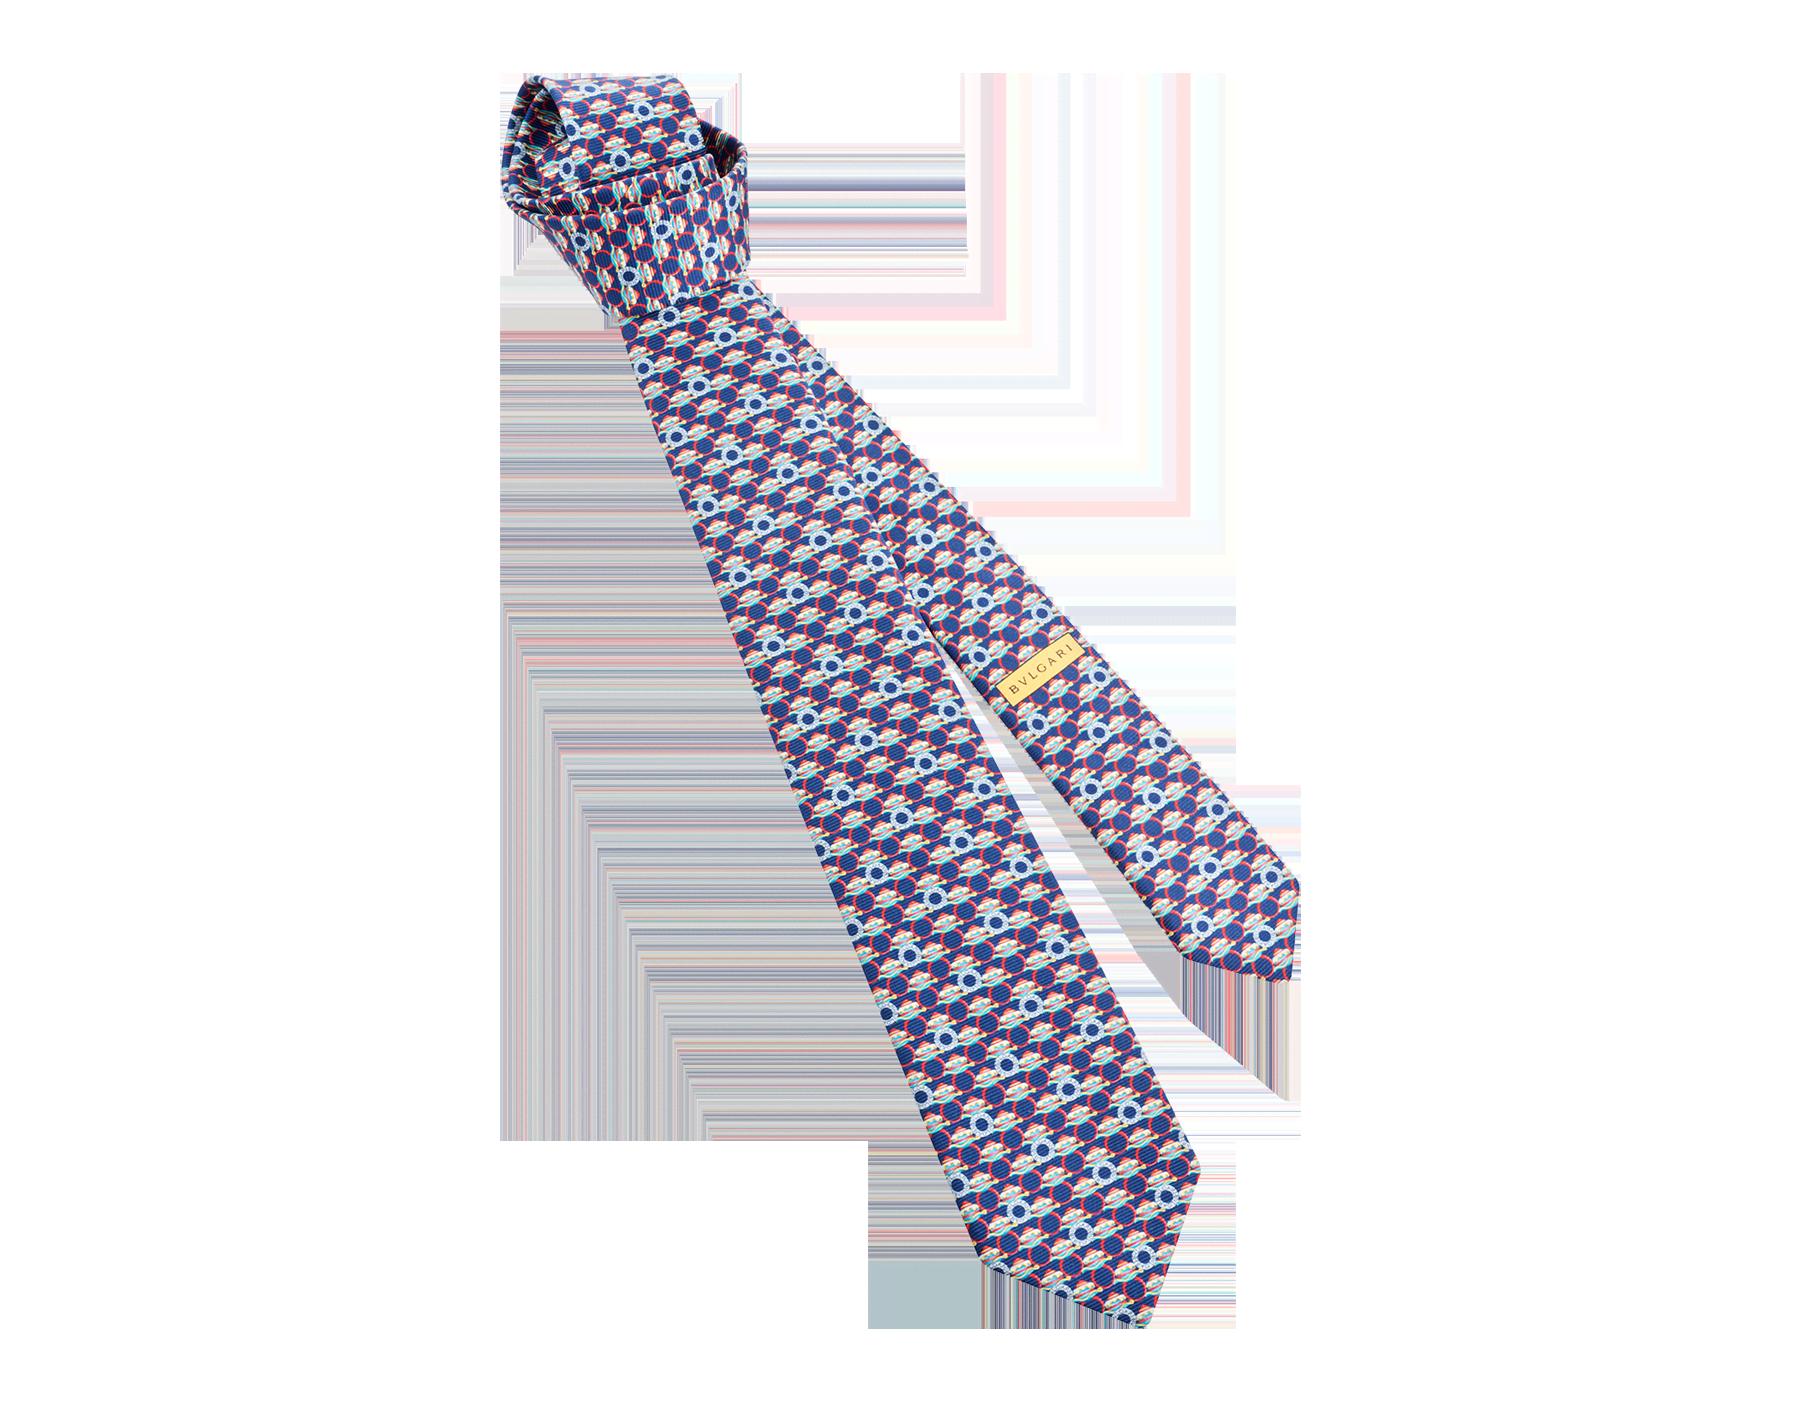 Navy Ring Cake Logo pattern seven-fold tie in fine saglione printed silk. 244196 image 1